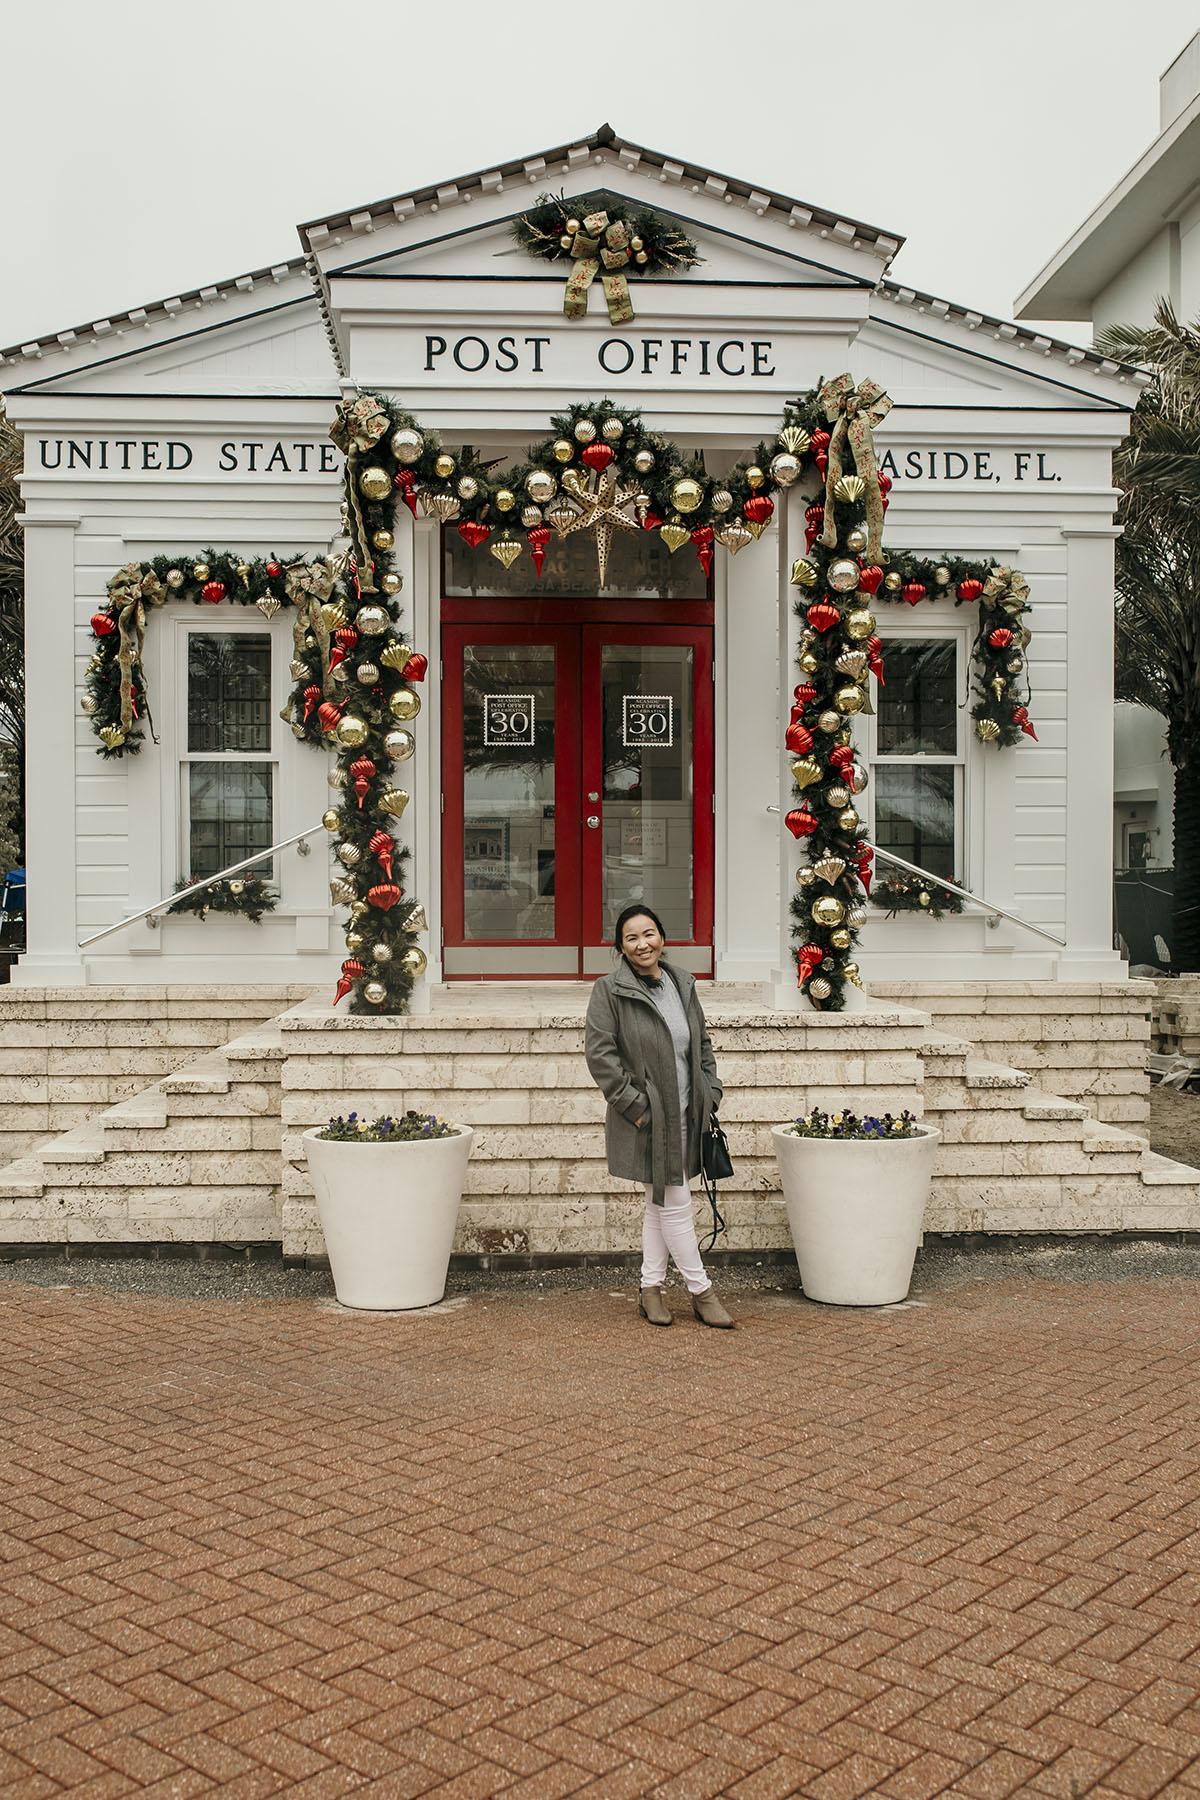 Post Office in Seaside Florida